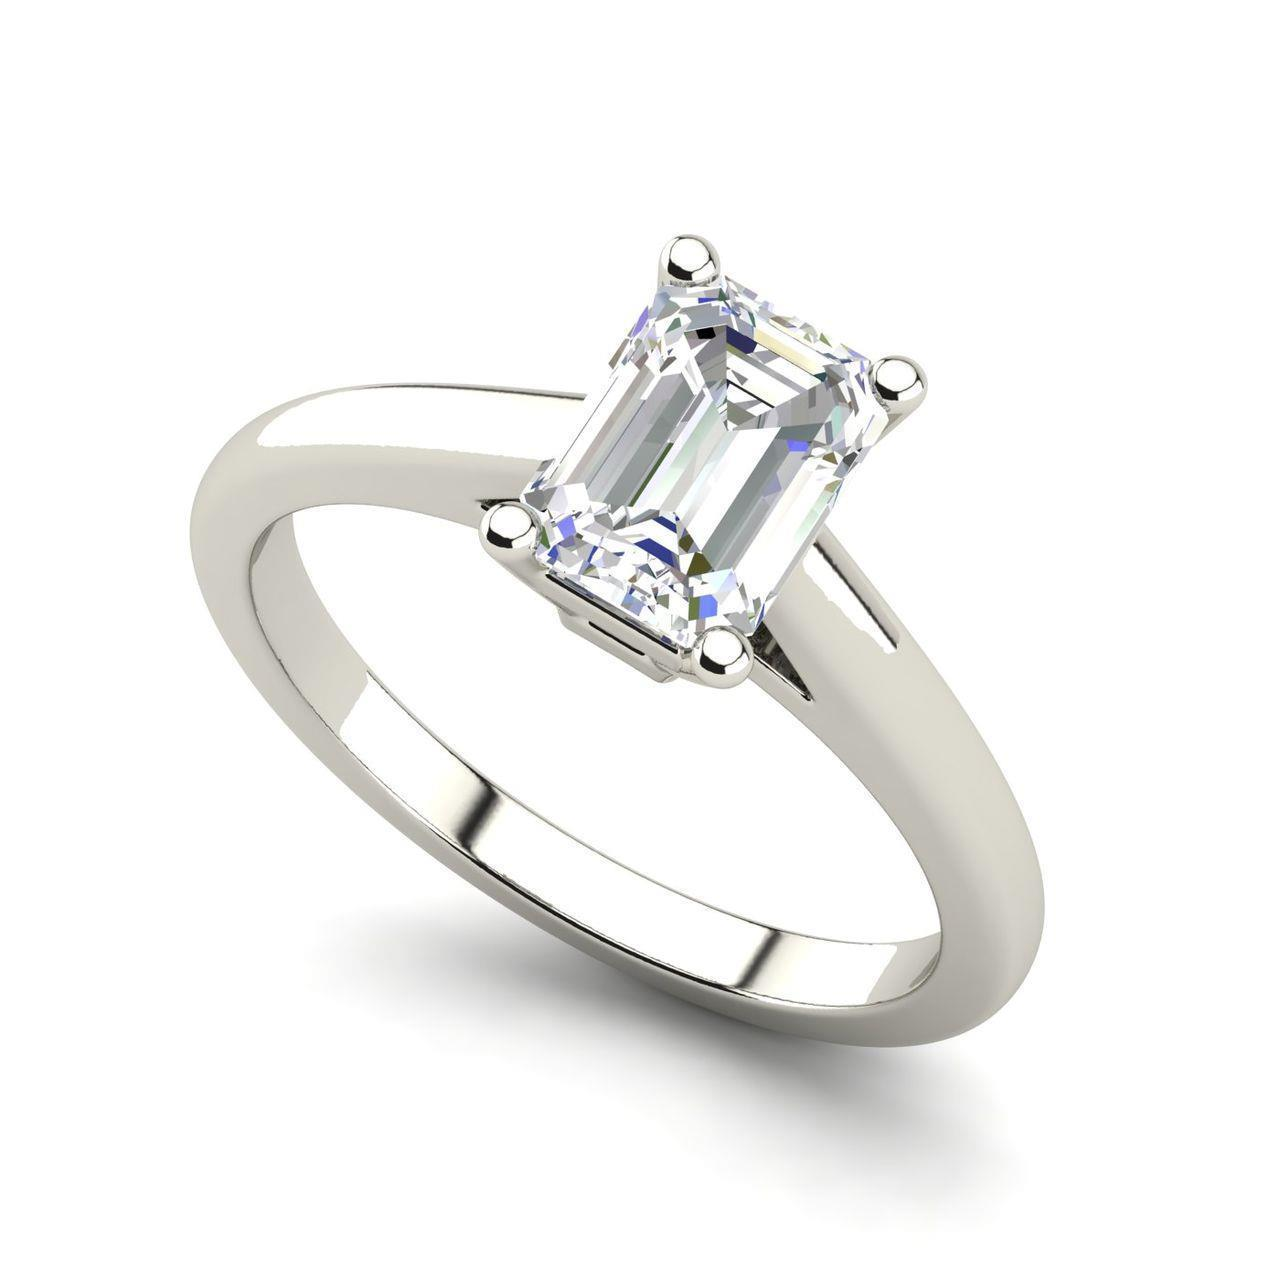 Solitaire 0 5 Carat Vvs2 F Emerald Cut Diamond Engagement Ring White Gold Ebay